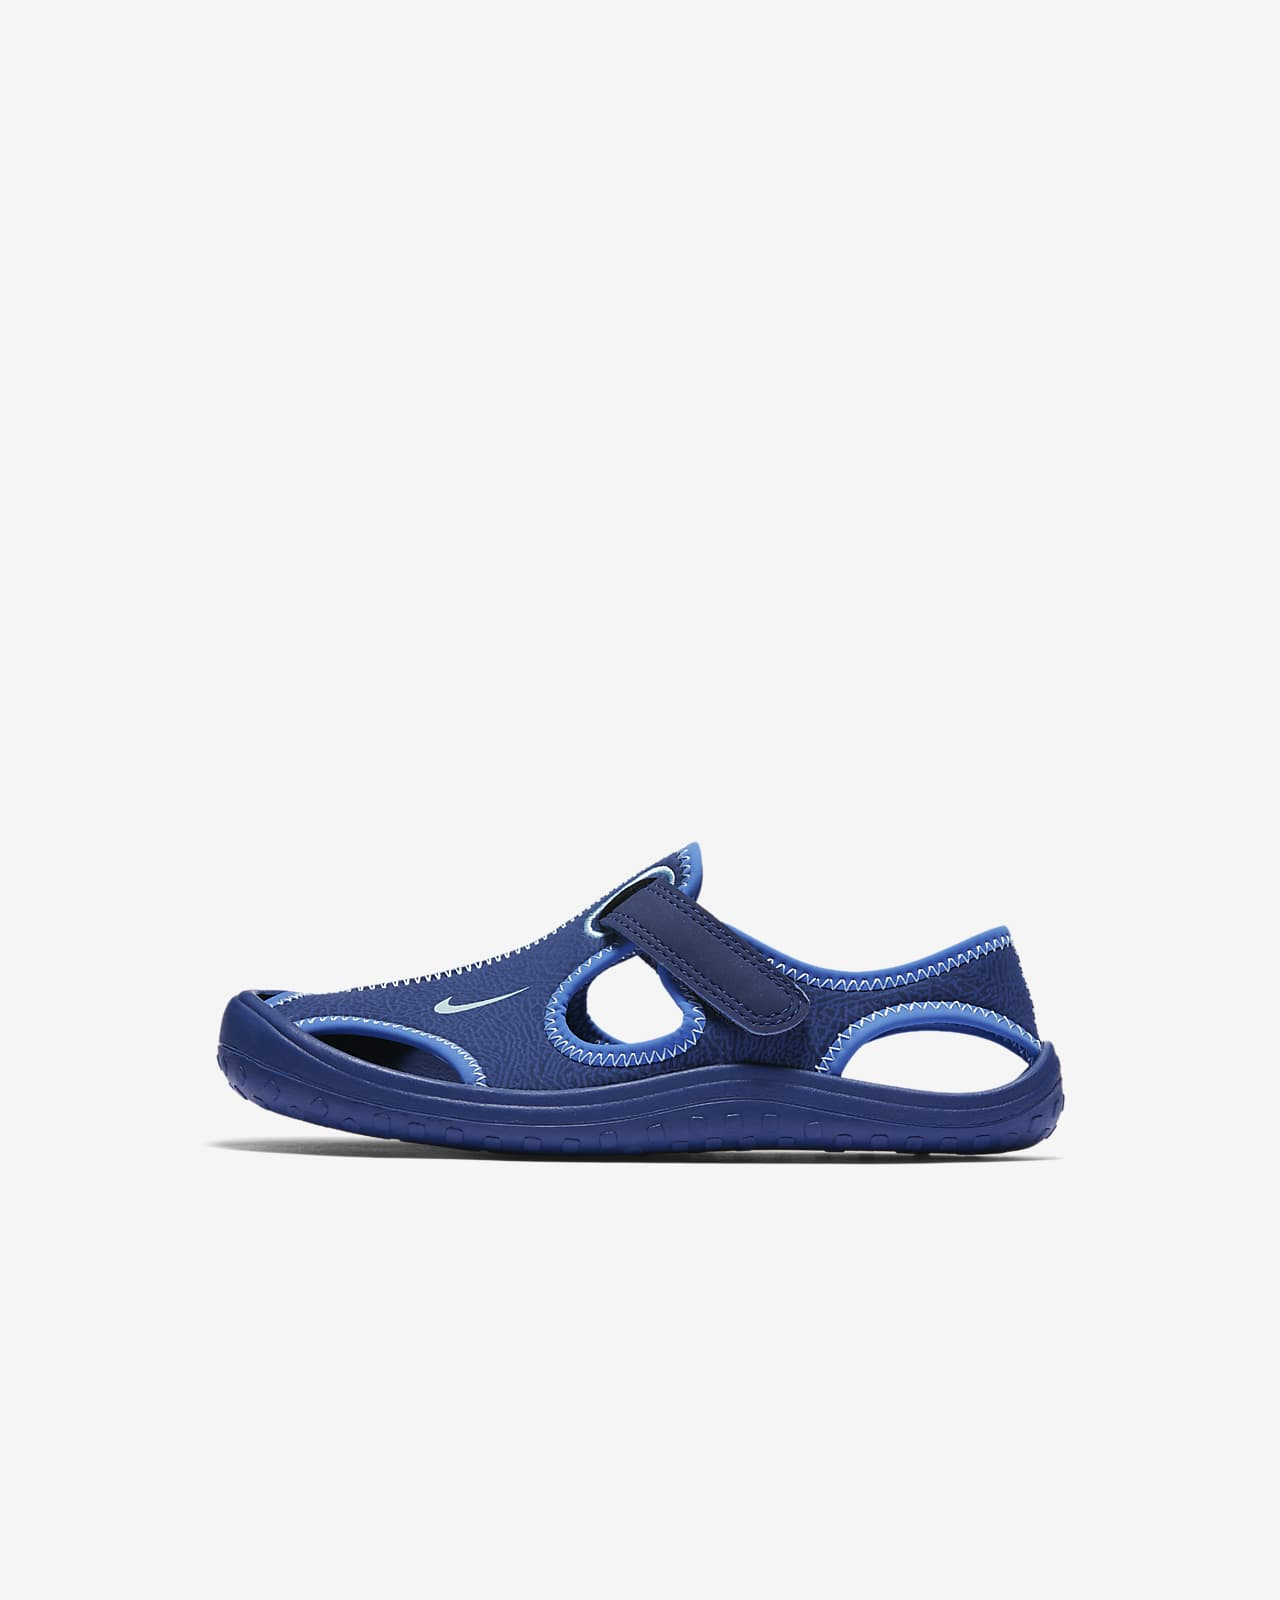 Nike Sunray Protect Sandalias - Niño/a pequeño/a